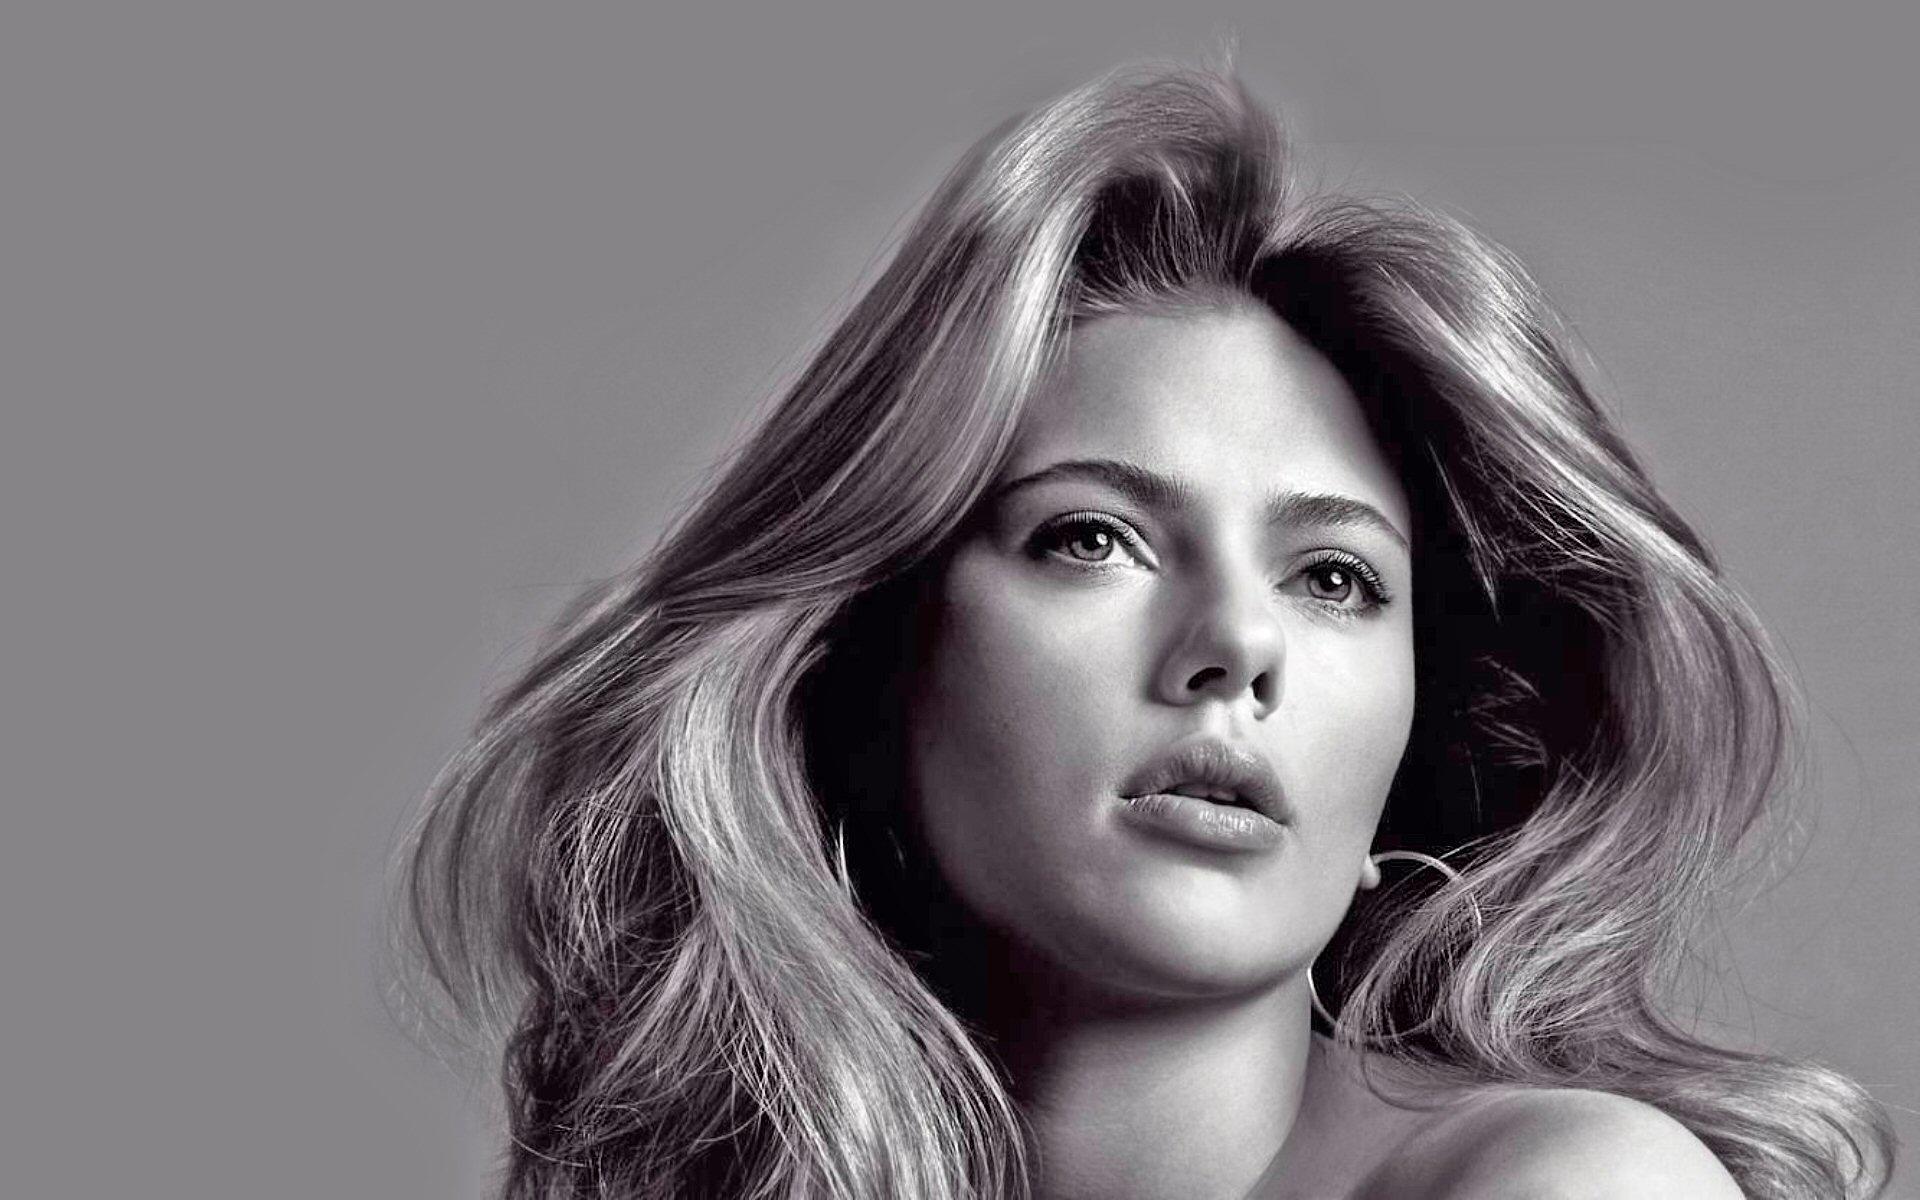 High Quality Hds Pics Of Scarlett Johansson As Redhead: Scarlett Johansson Hd Wallpaper